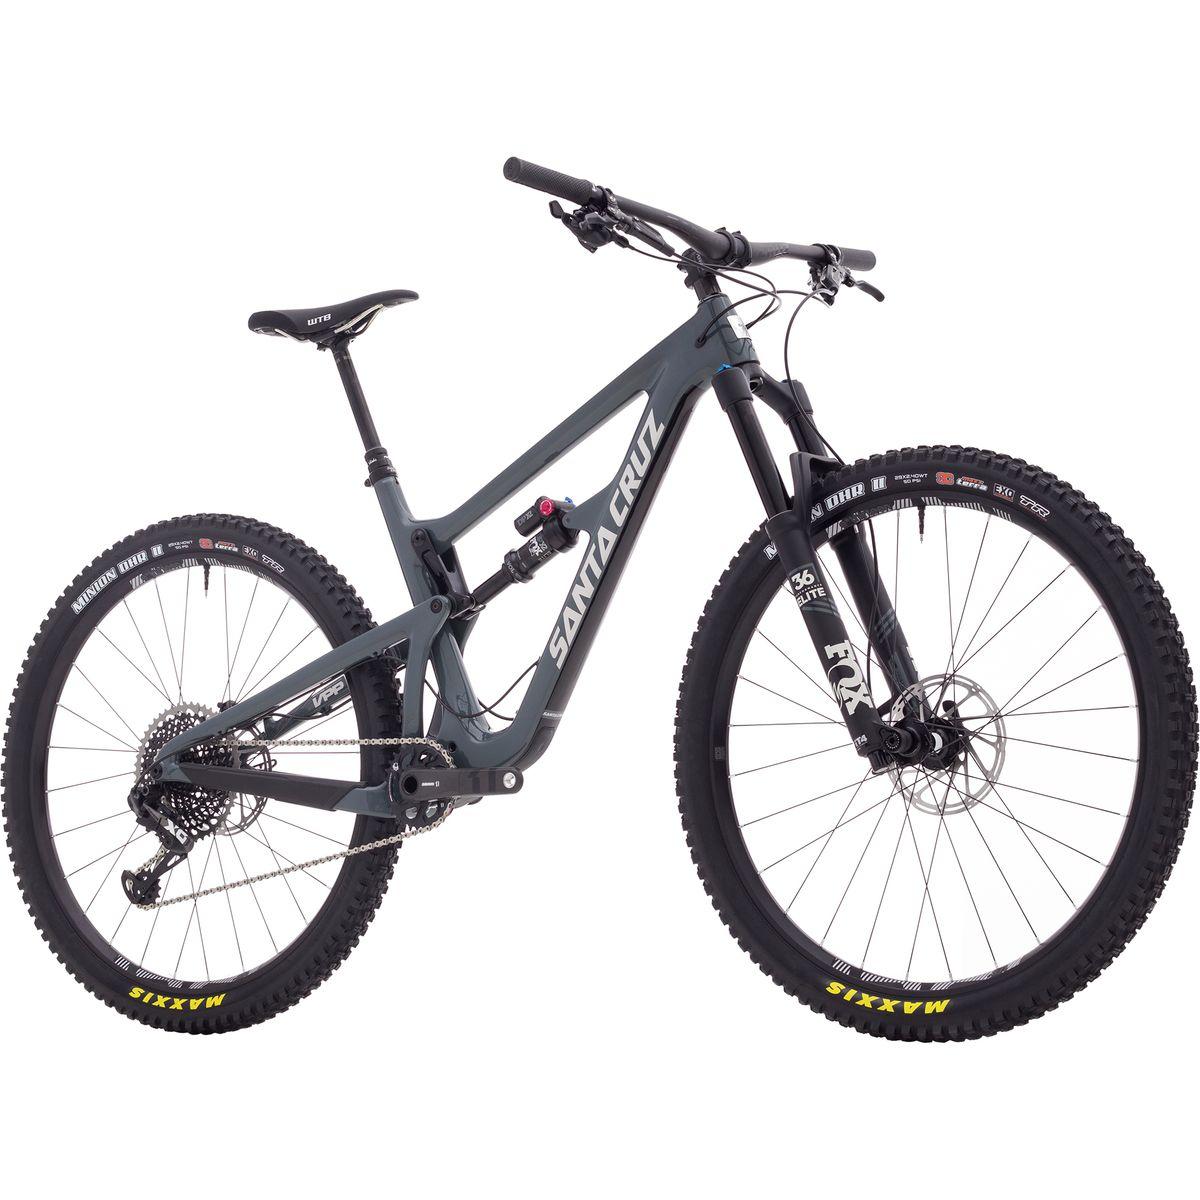 Santa Cruz Bicycles Hightower LT Carbon CC 29 X01 Eagle Complete ...